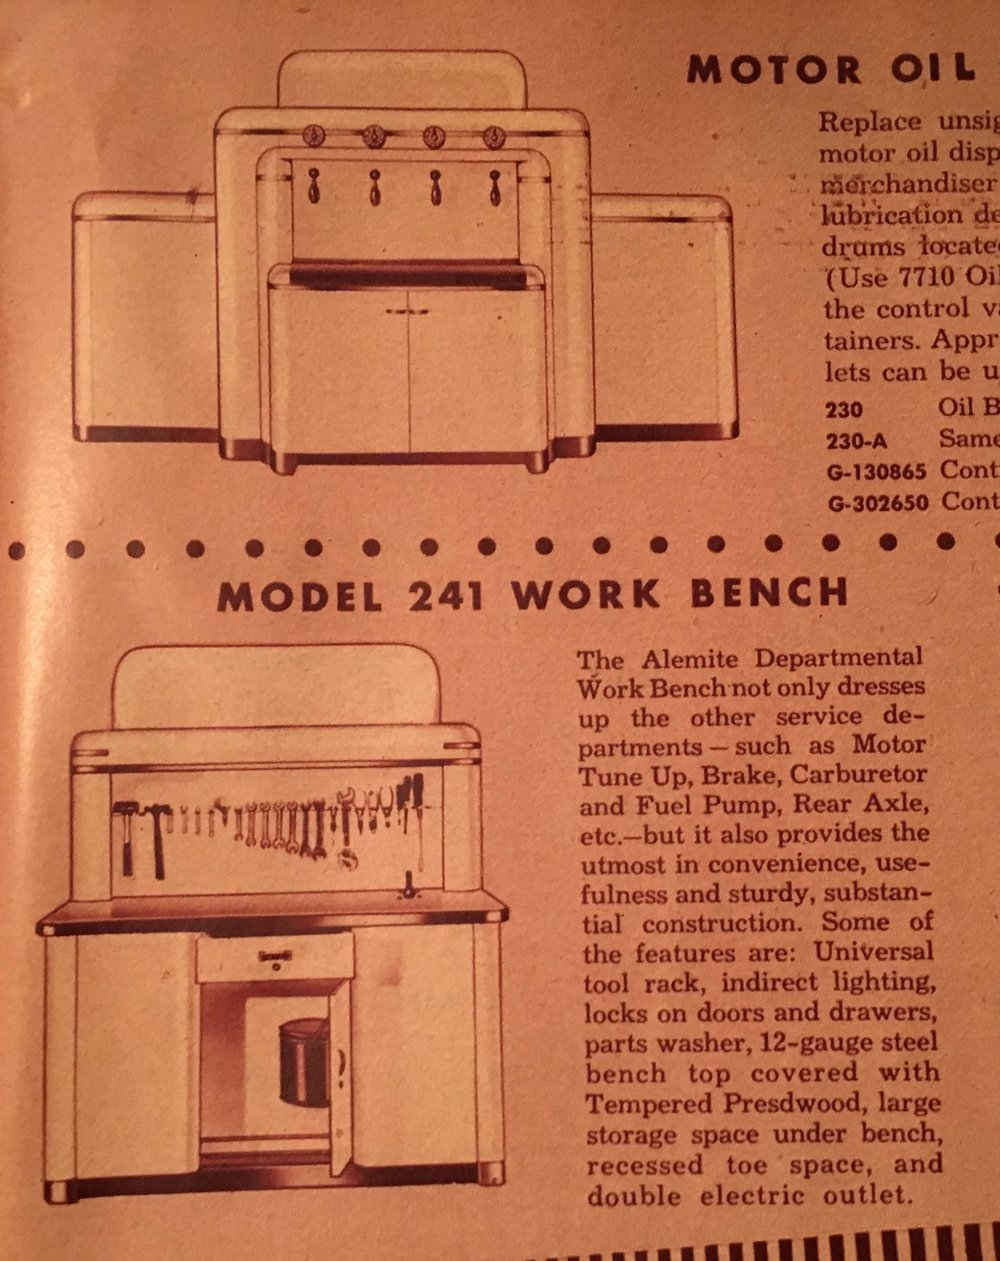 Alemite_Ad_1945_benches.jpg